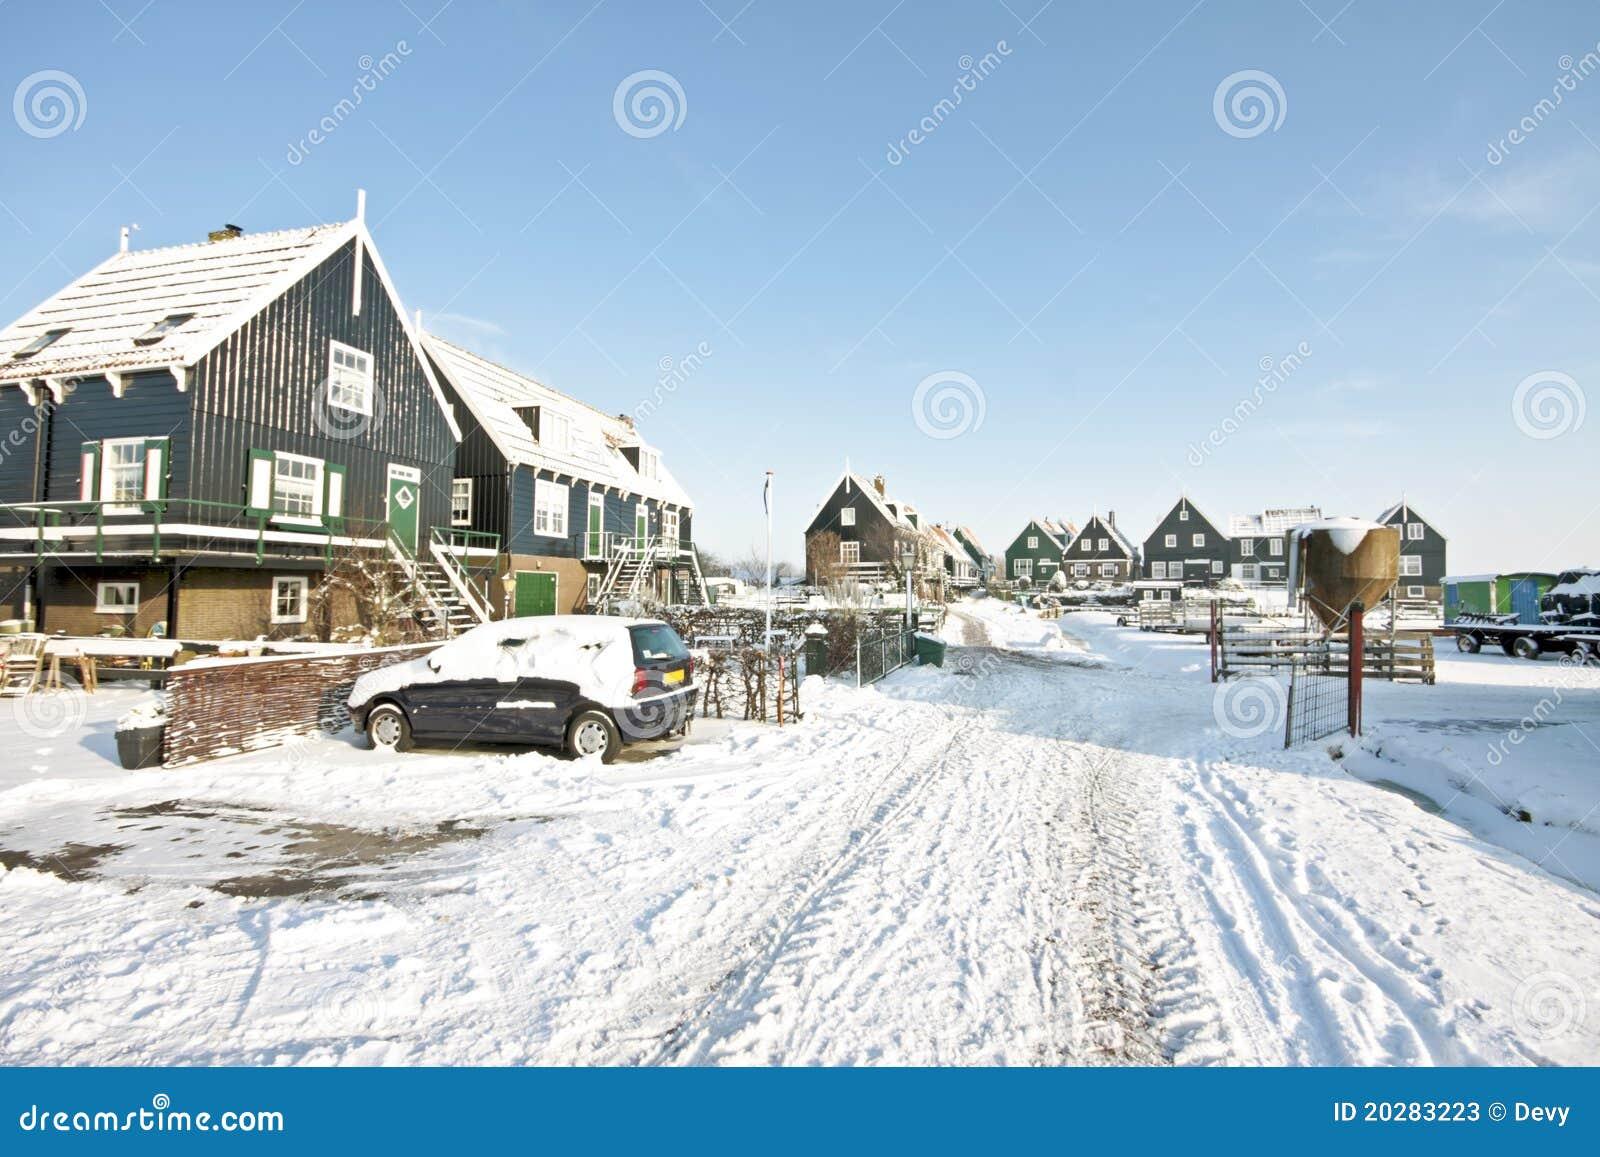 marken in winter in the netherlands stock photos image. Black Bedroom Furniture Sets. Home Design Ideas